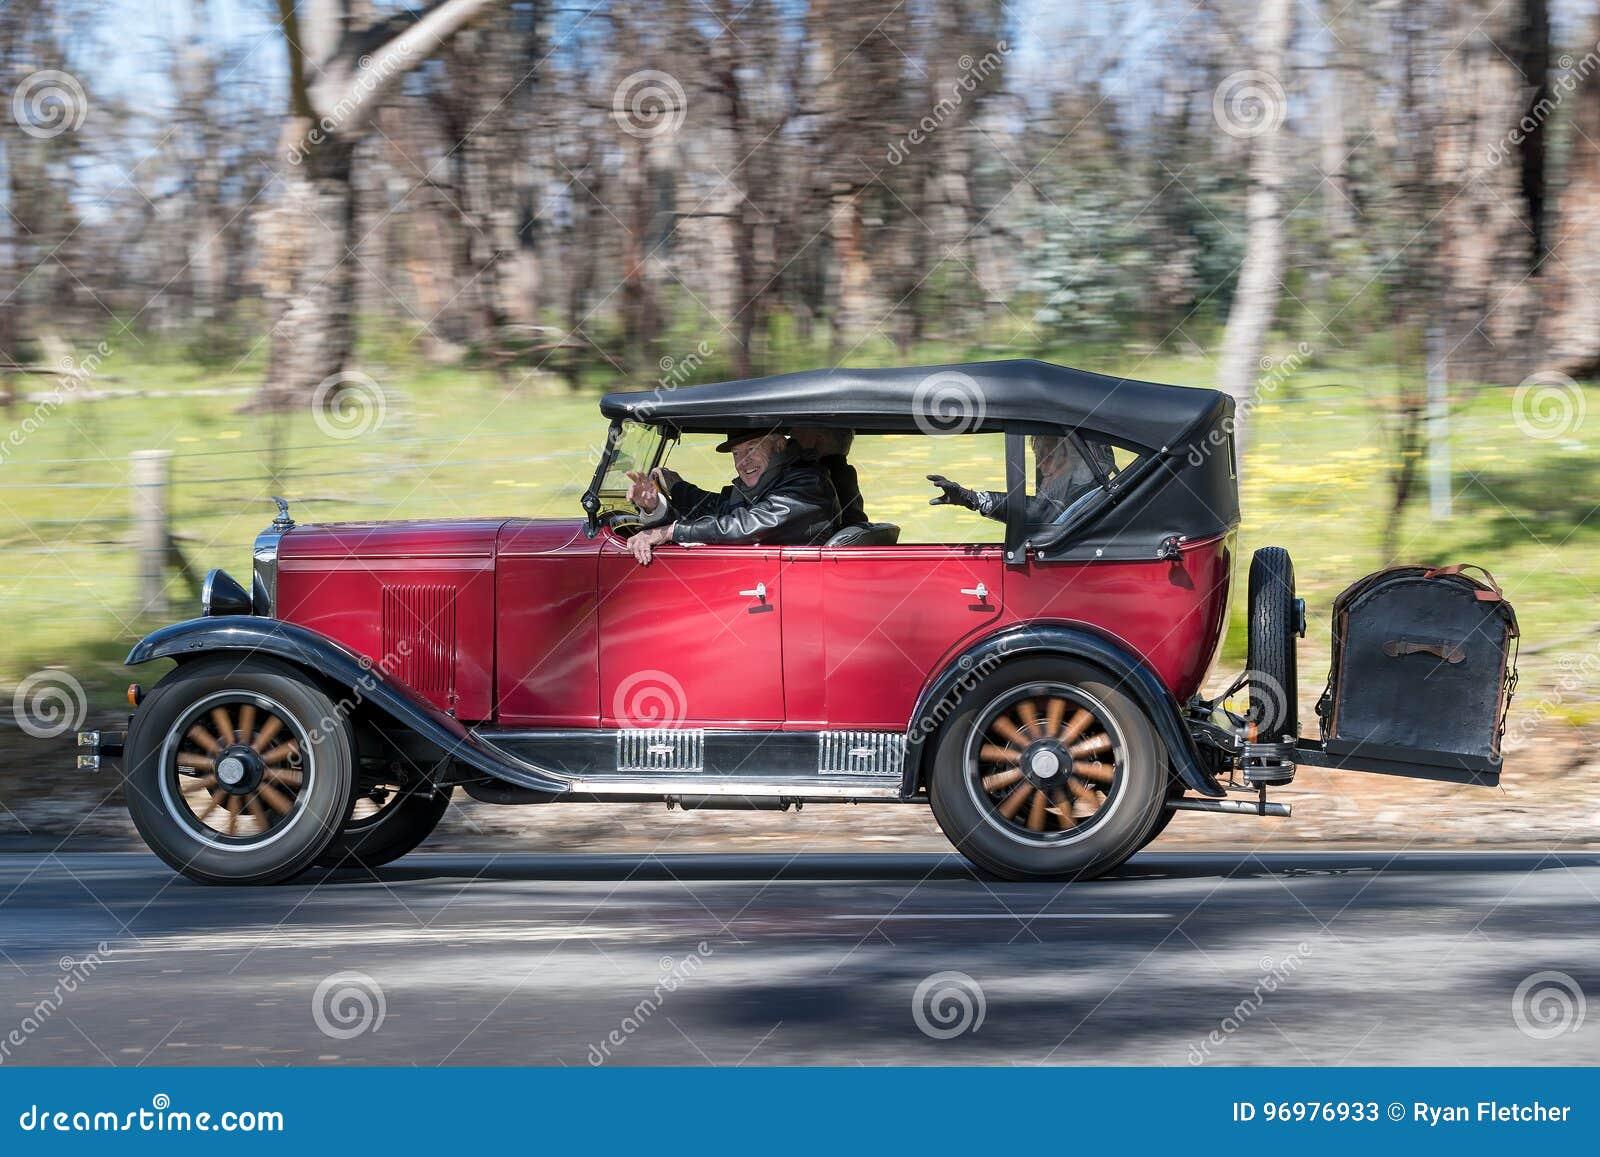 1929 Chevrolet Tourer Sedan Driving On Country Road Editorial Stock ...